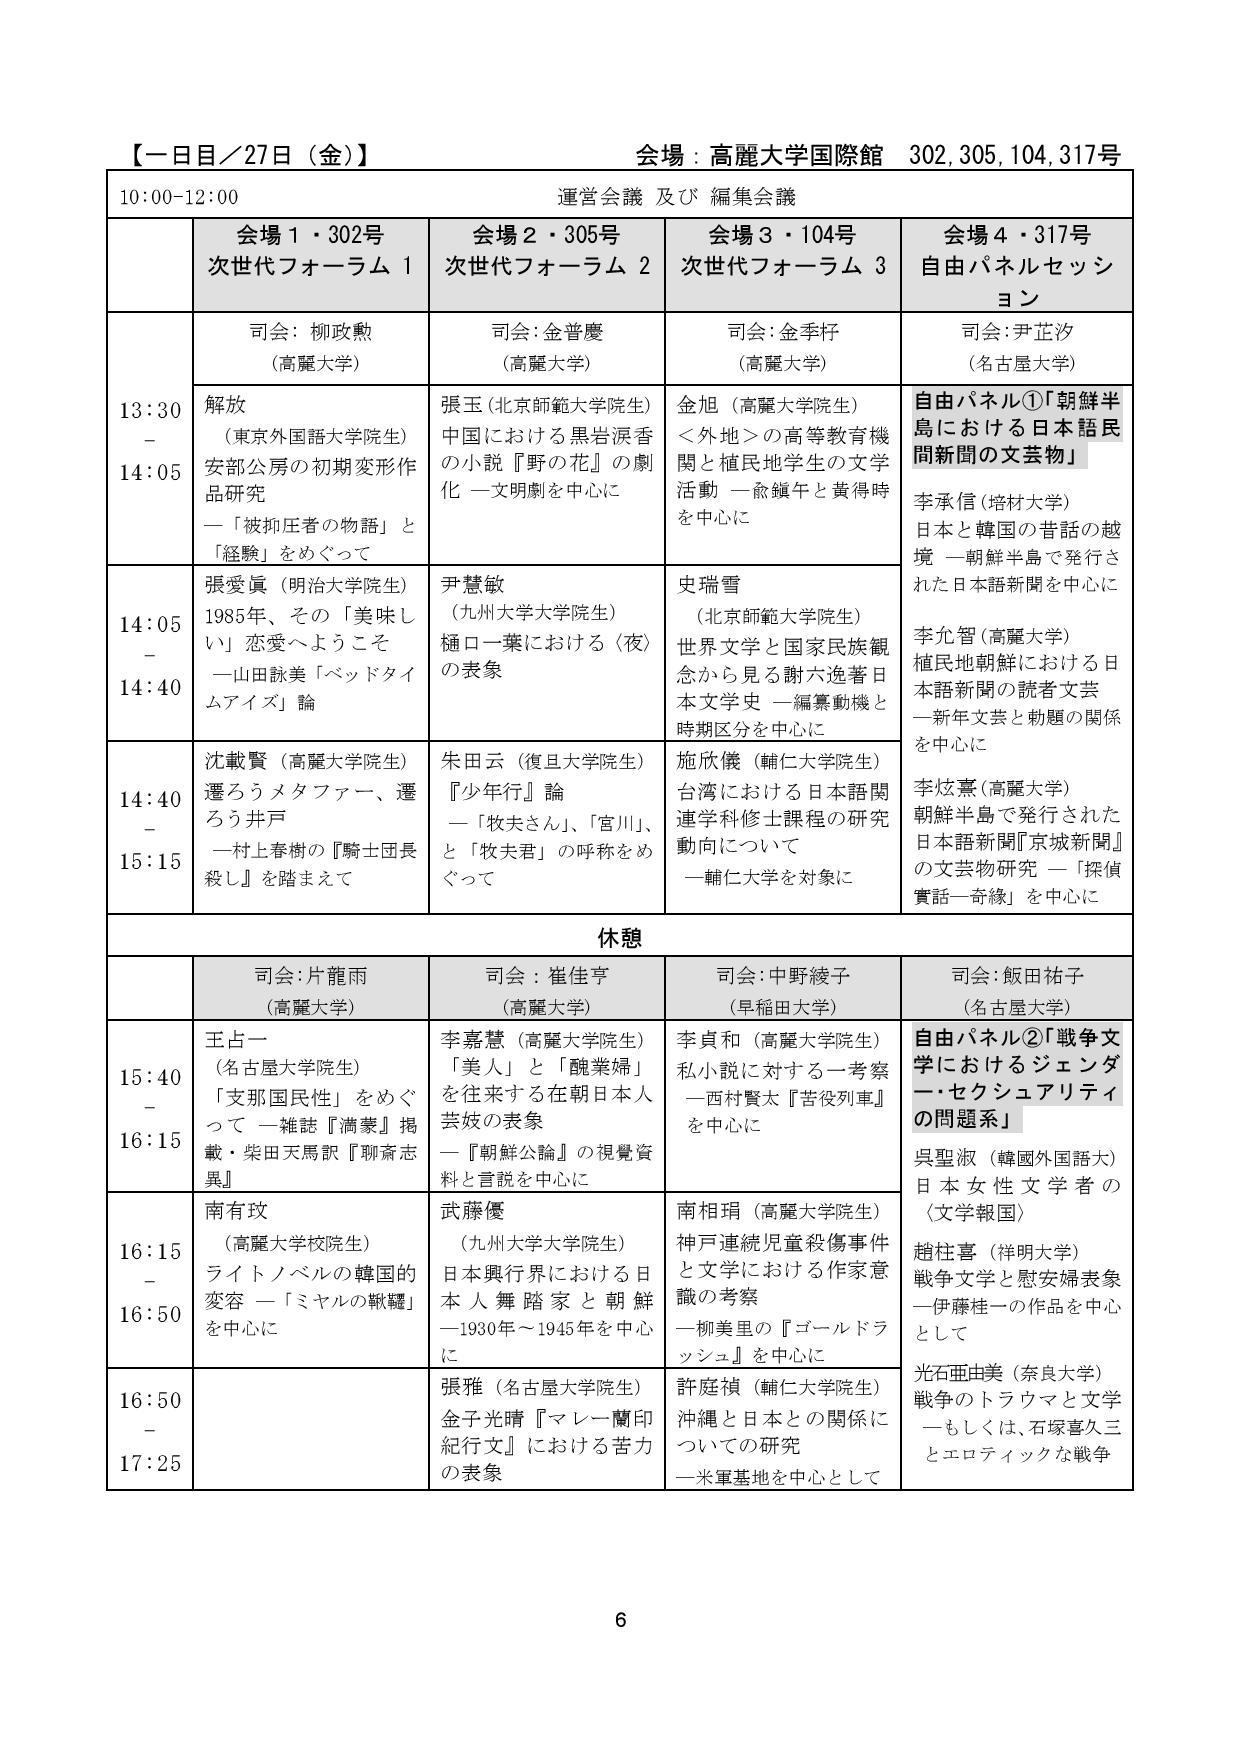 3-program-page-002